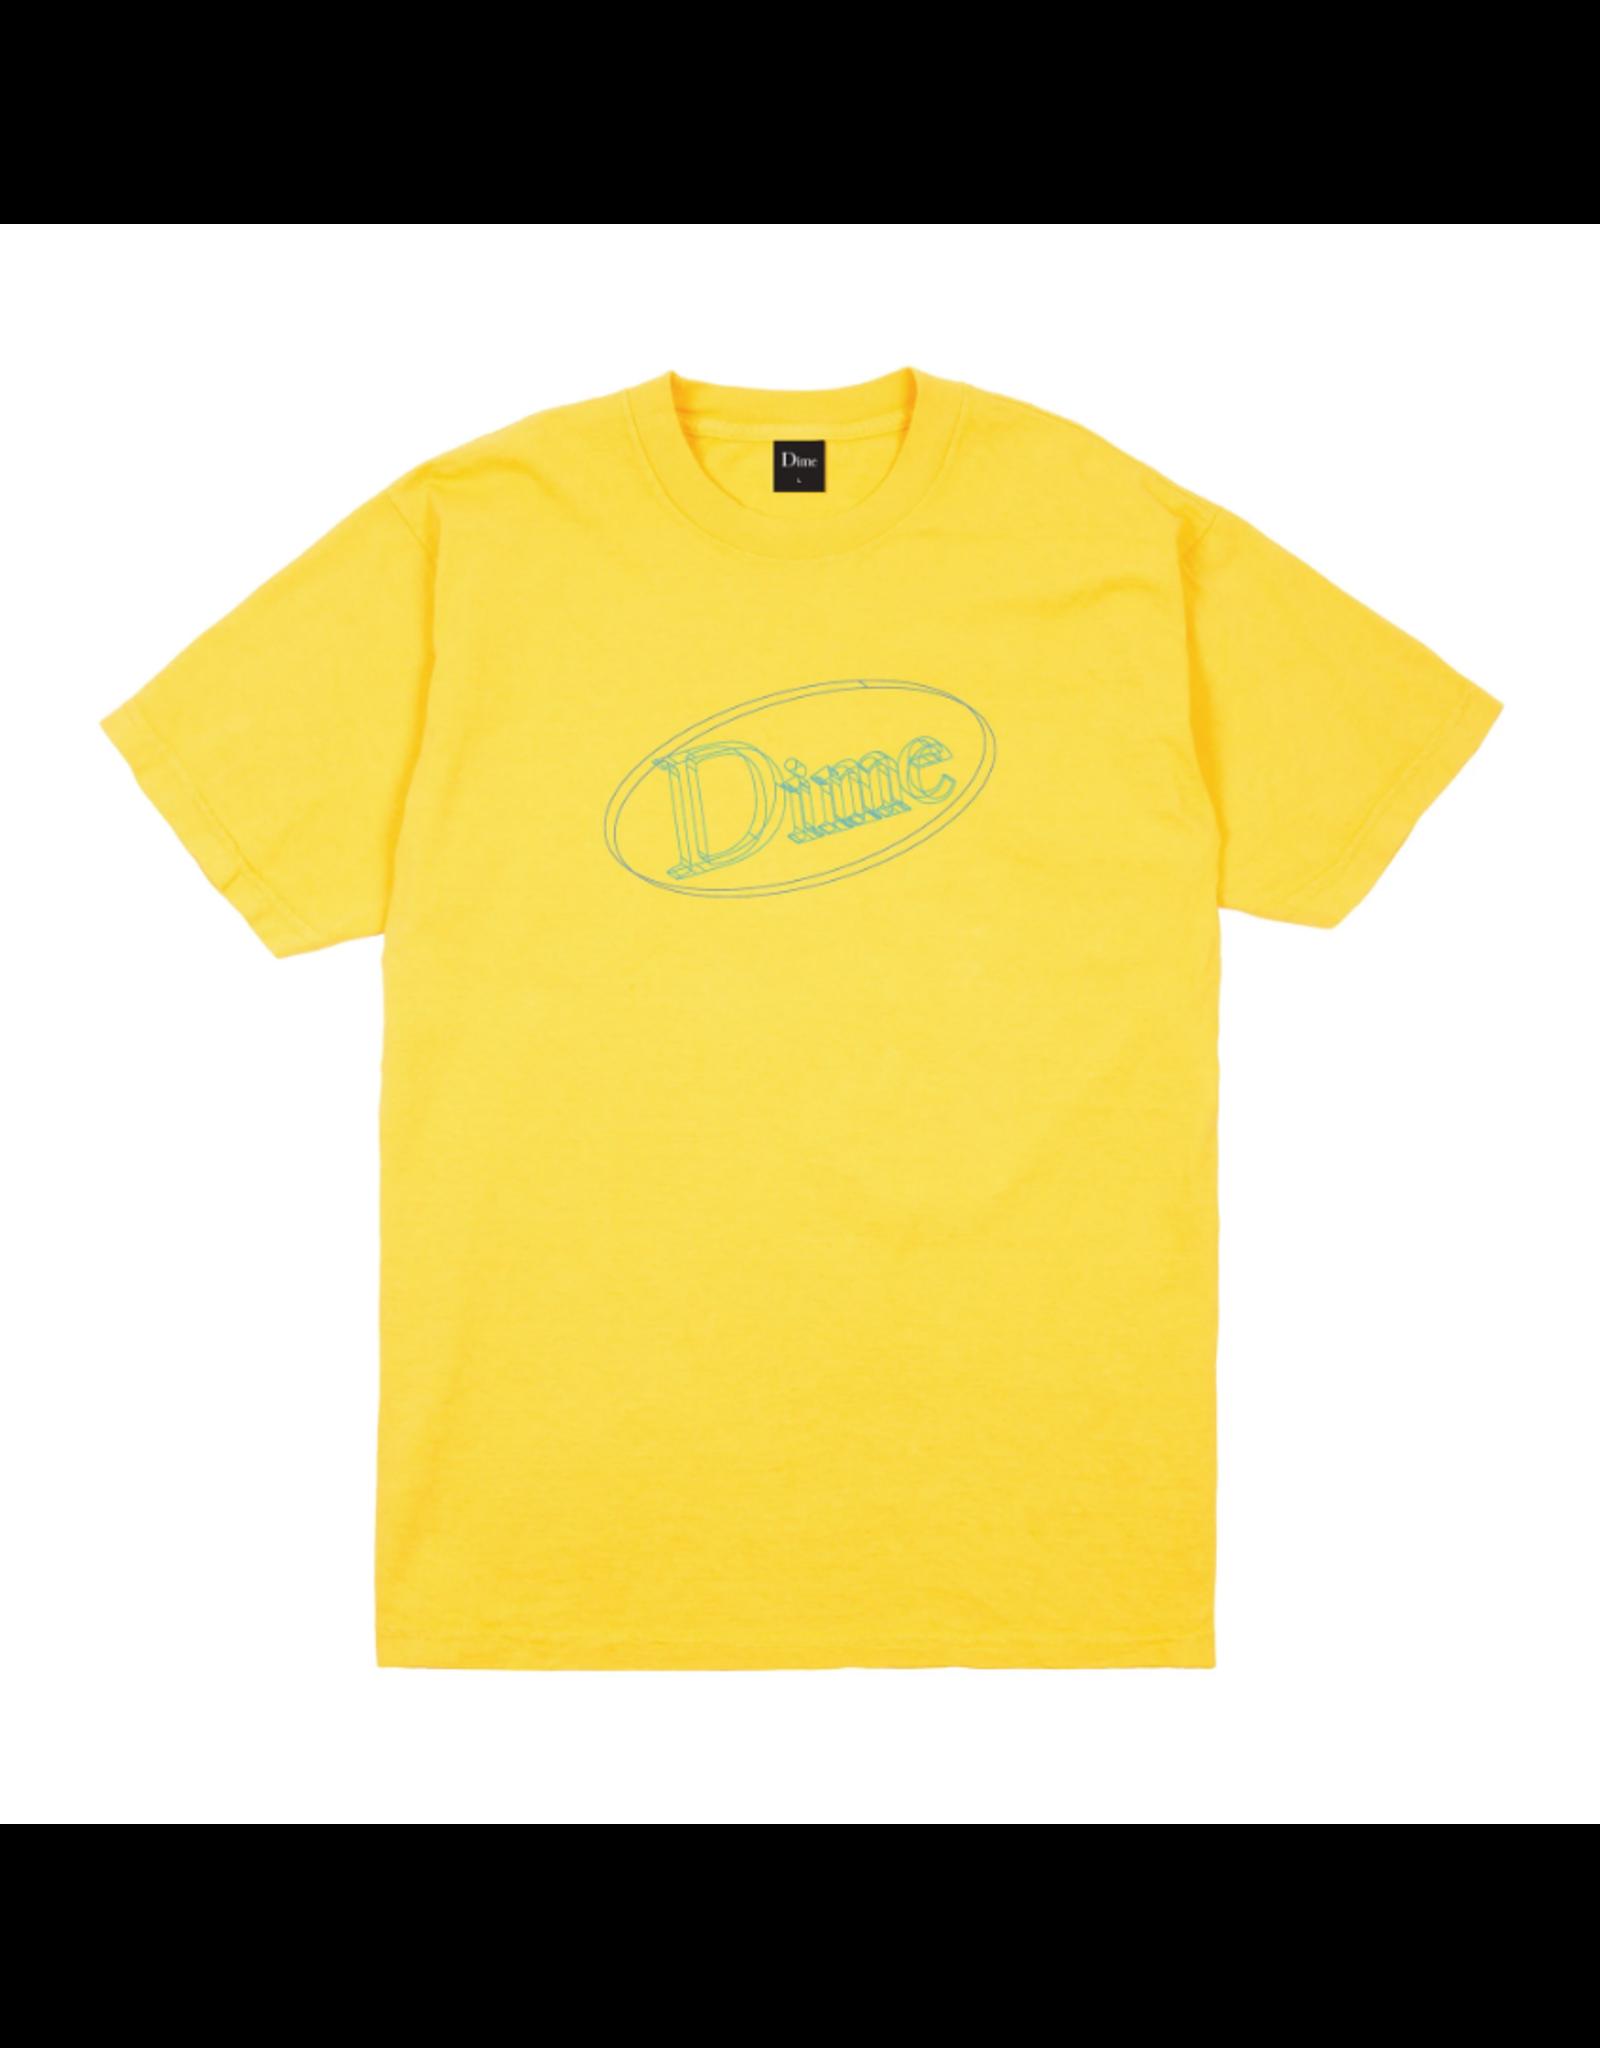 Dime Dimecad T-Shirt - Yellow